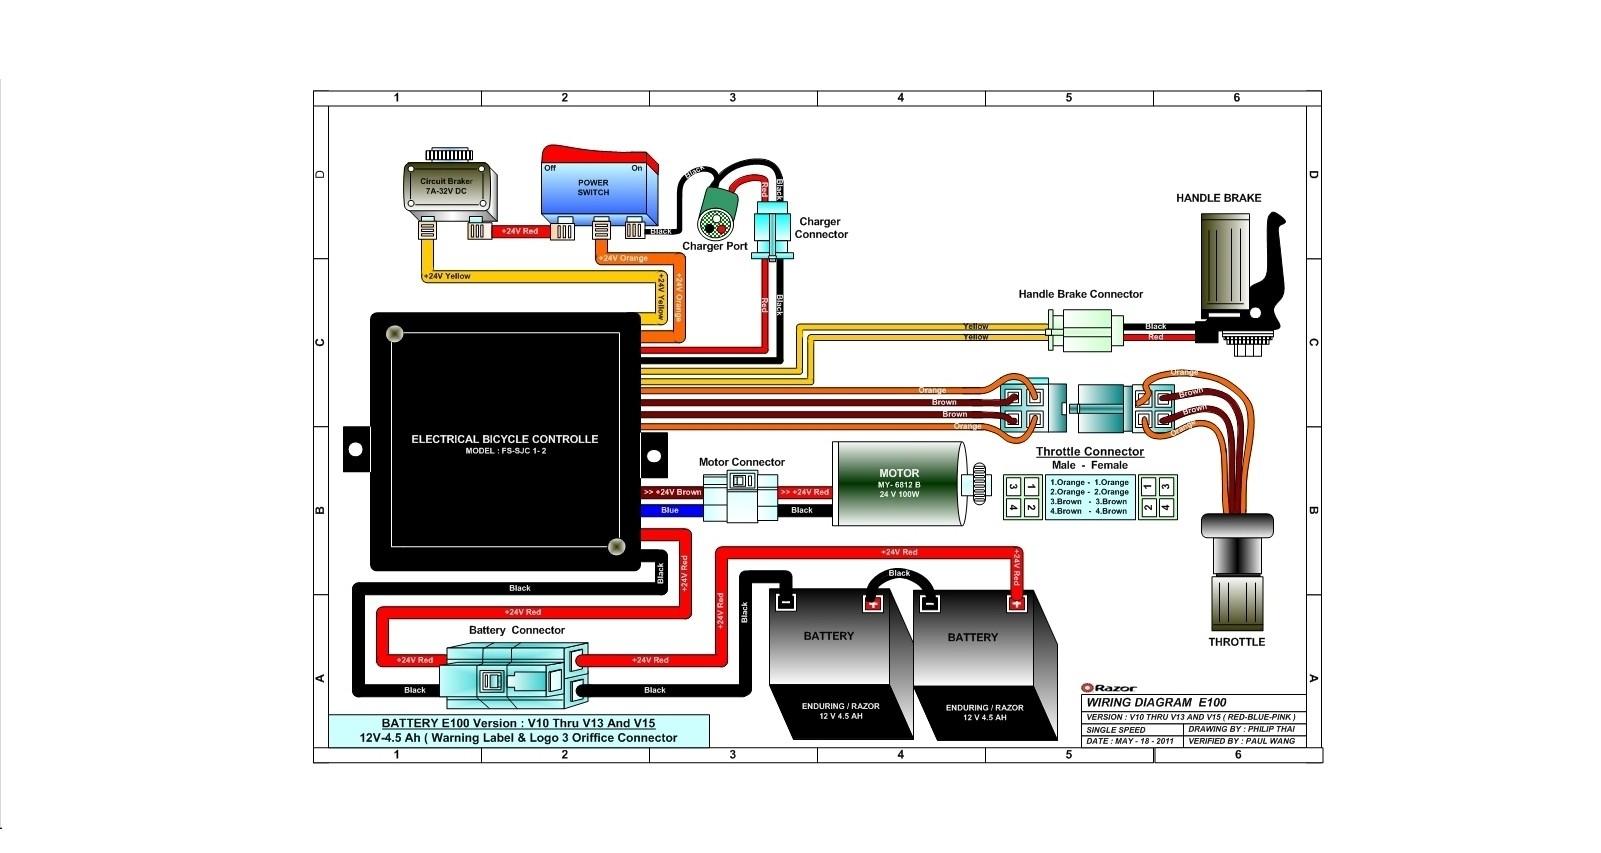 E100 versions 10 13 & 15 Wiring Diagram Razor Manuals